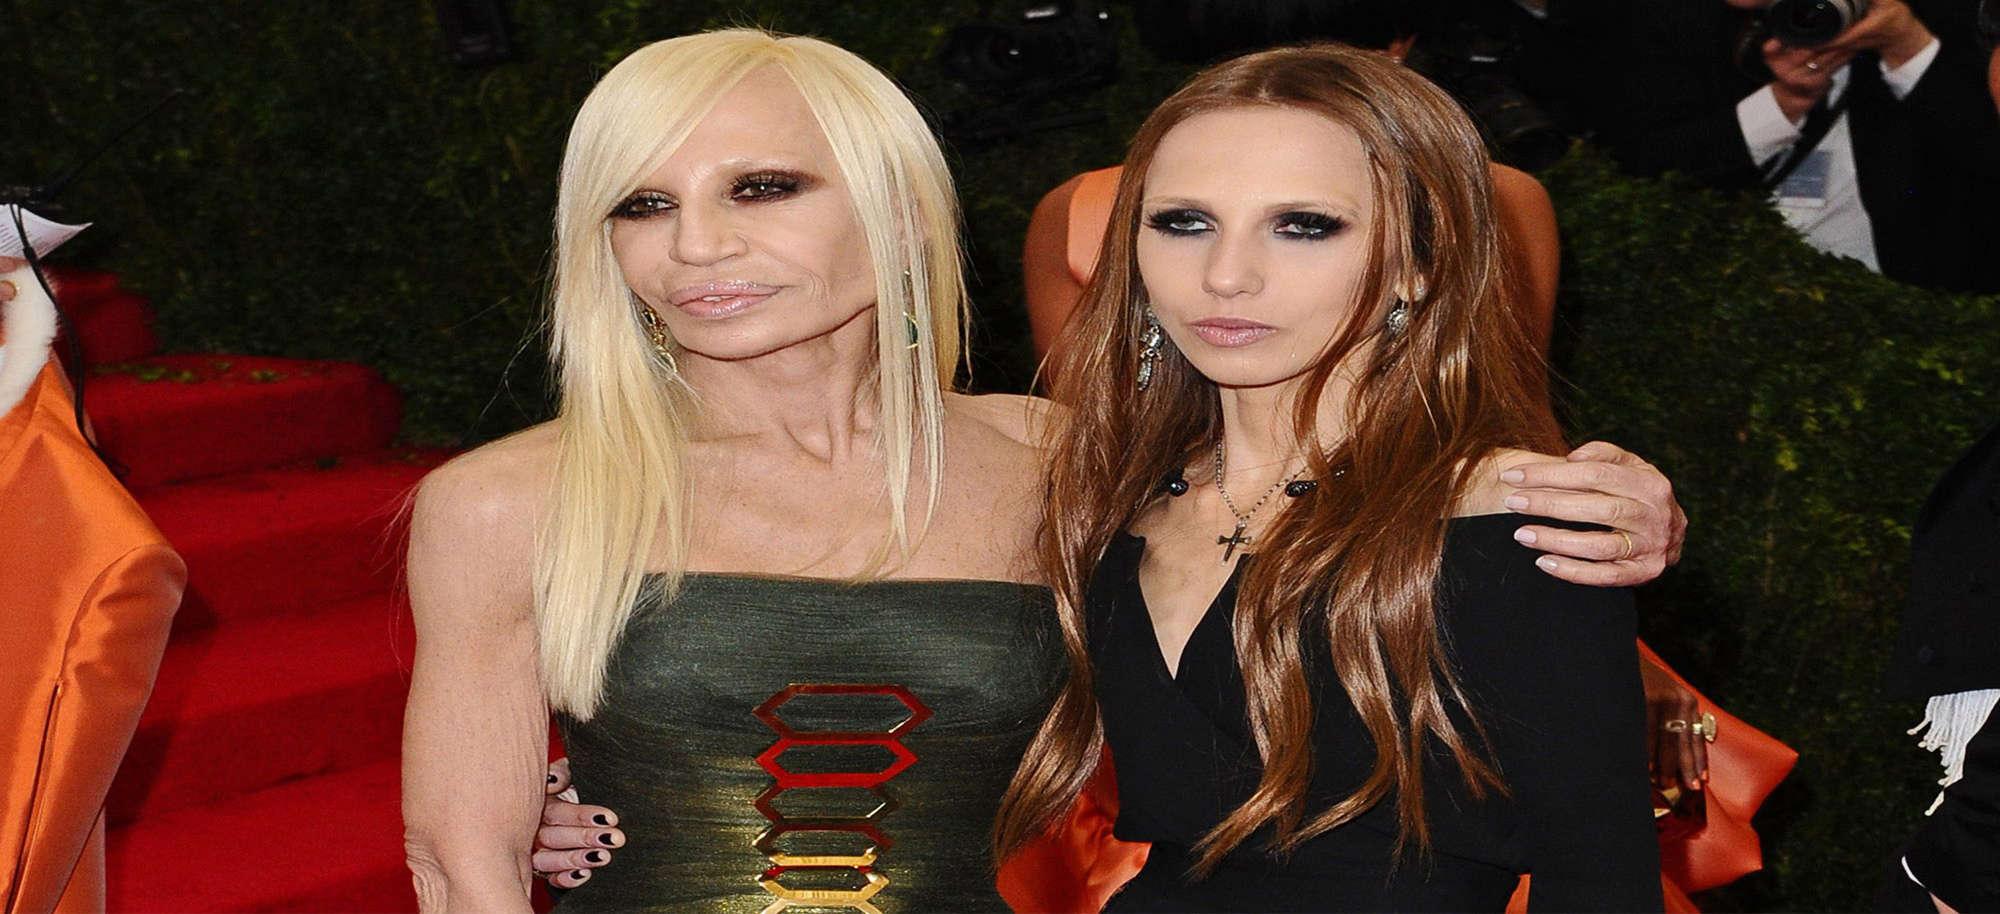 Donatella Versace and daughter Allegra